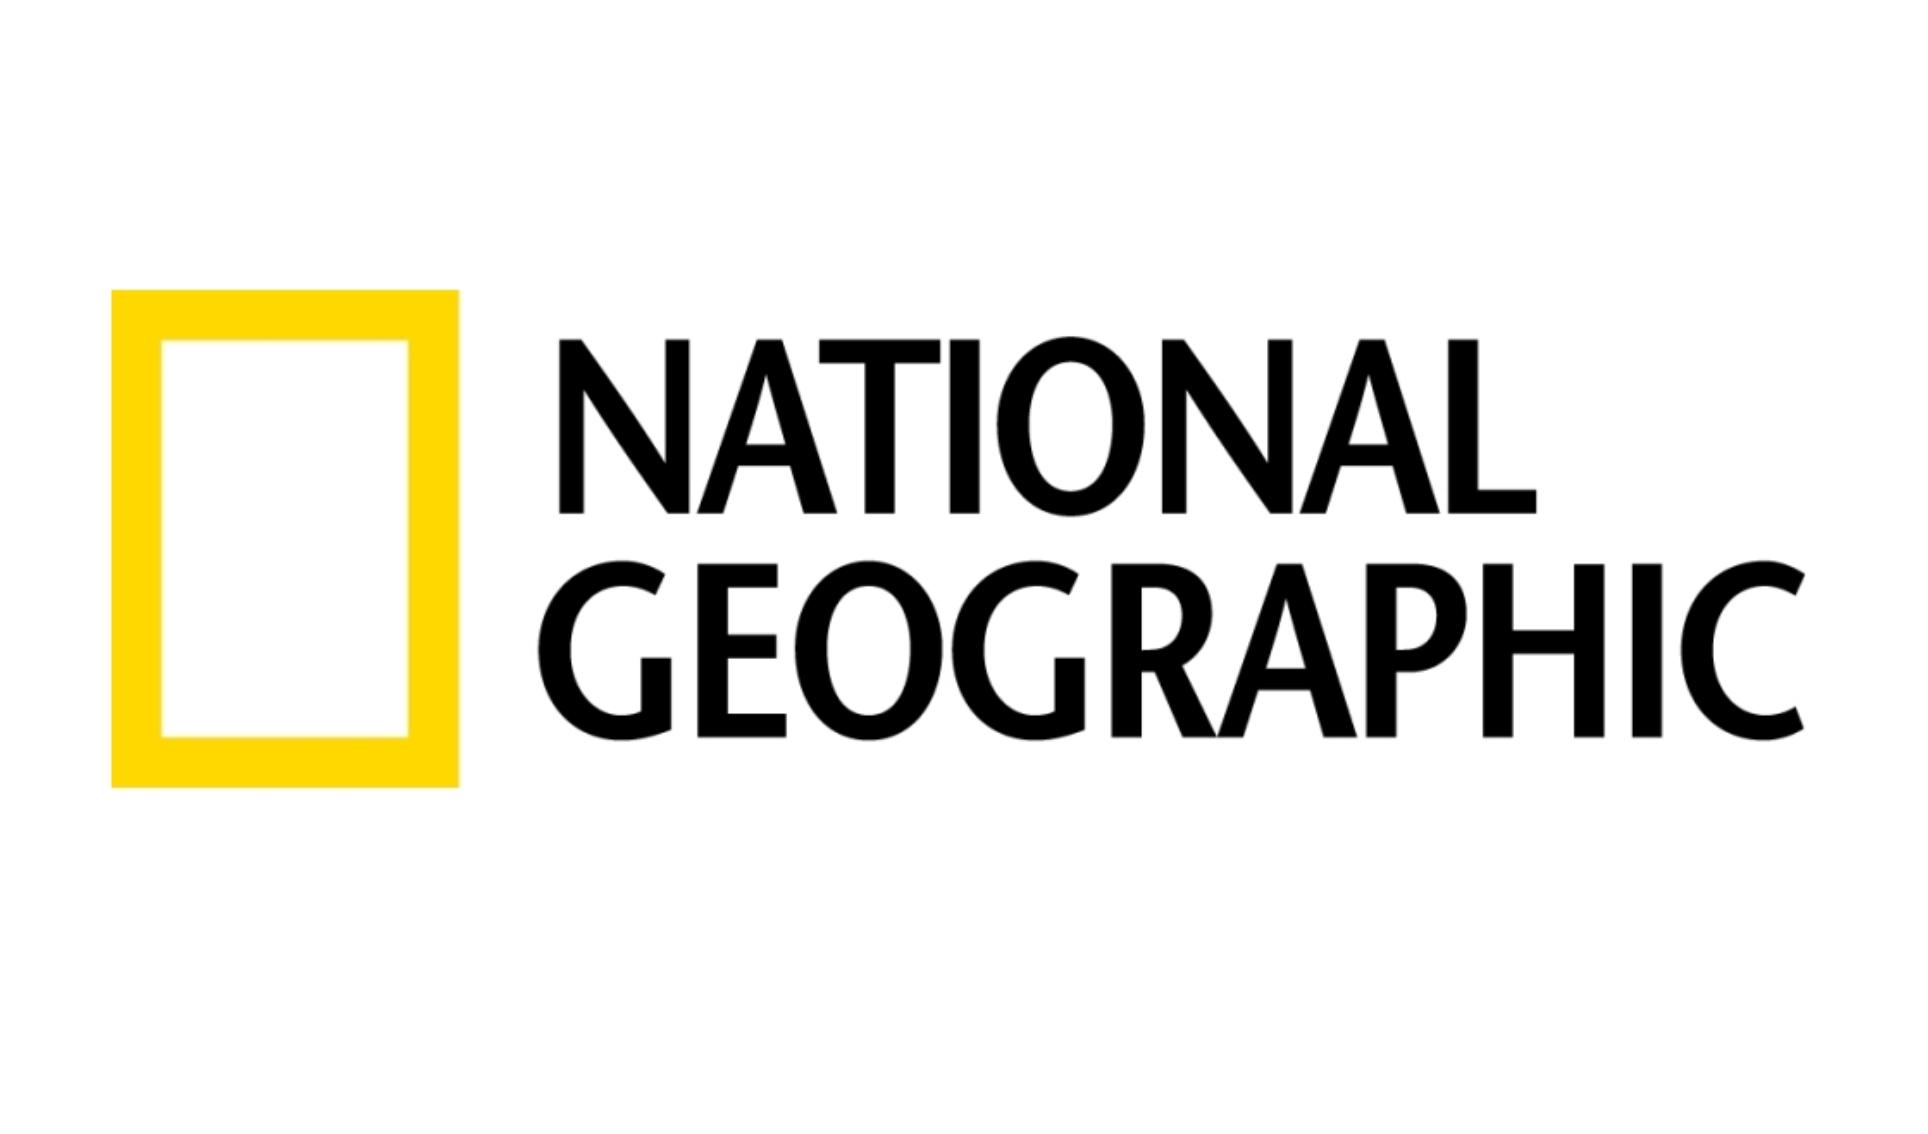 National-Geographic-Jungle-Straws-Bamboo-Straw-UK-USA-Worldwide.png